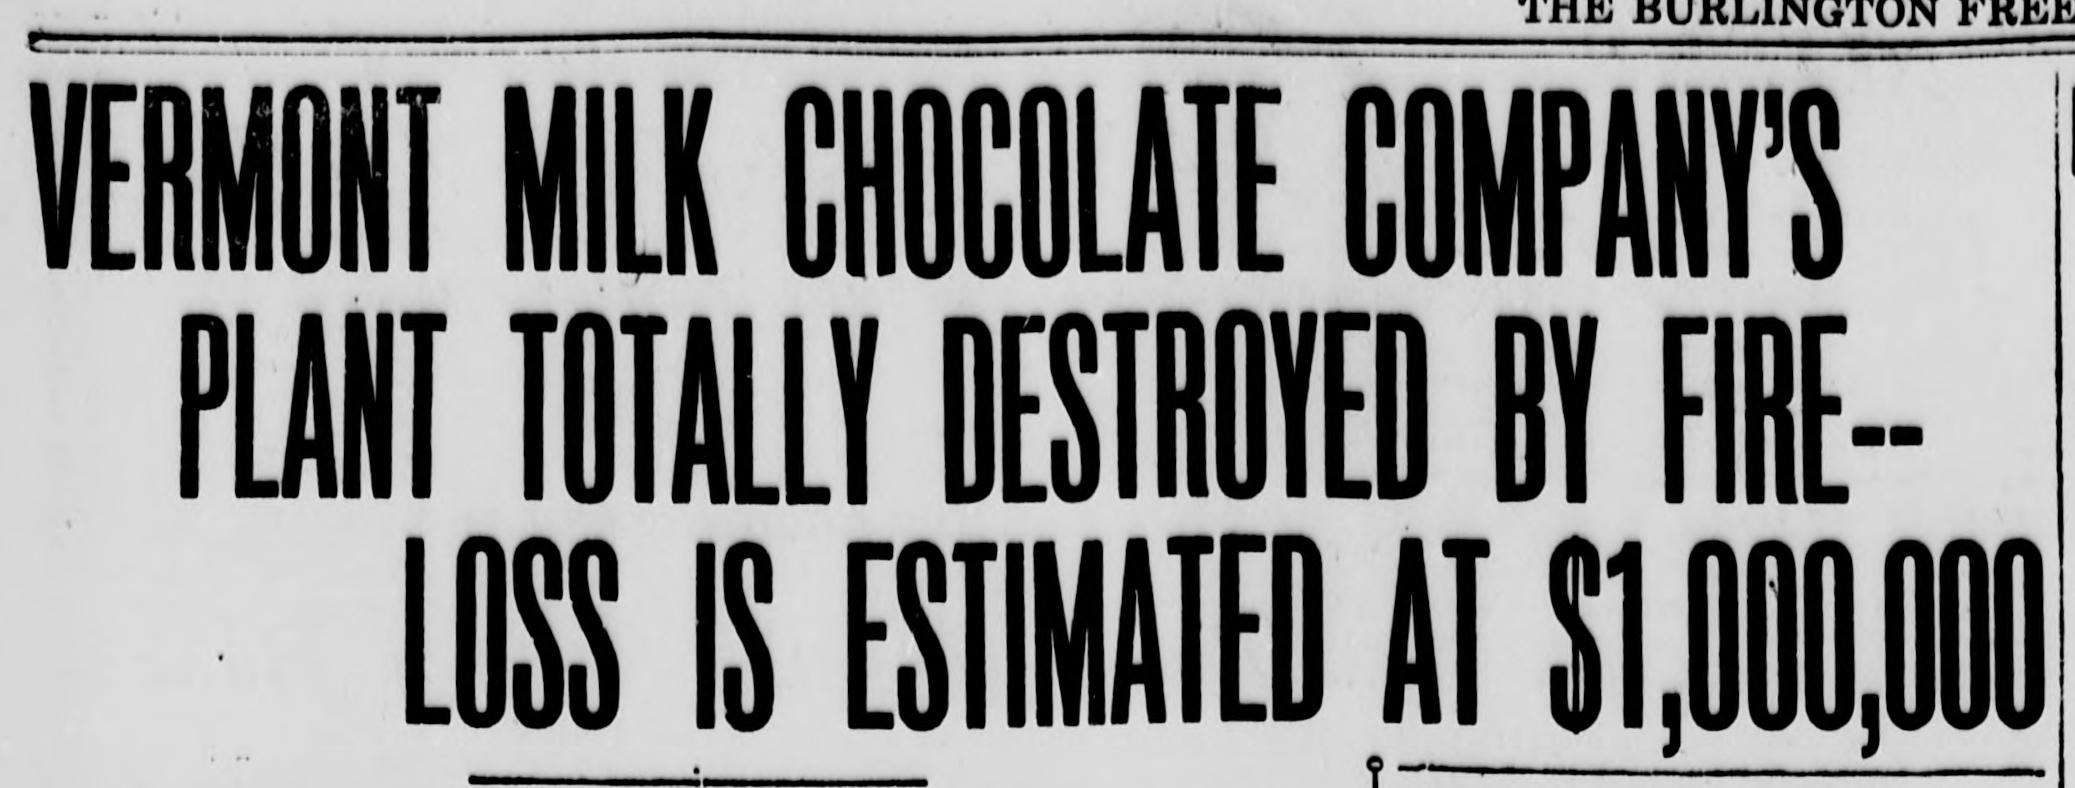 firechocolate